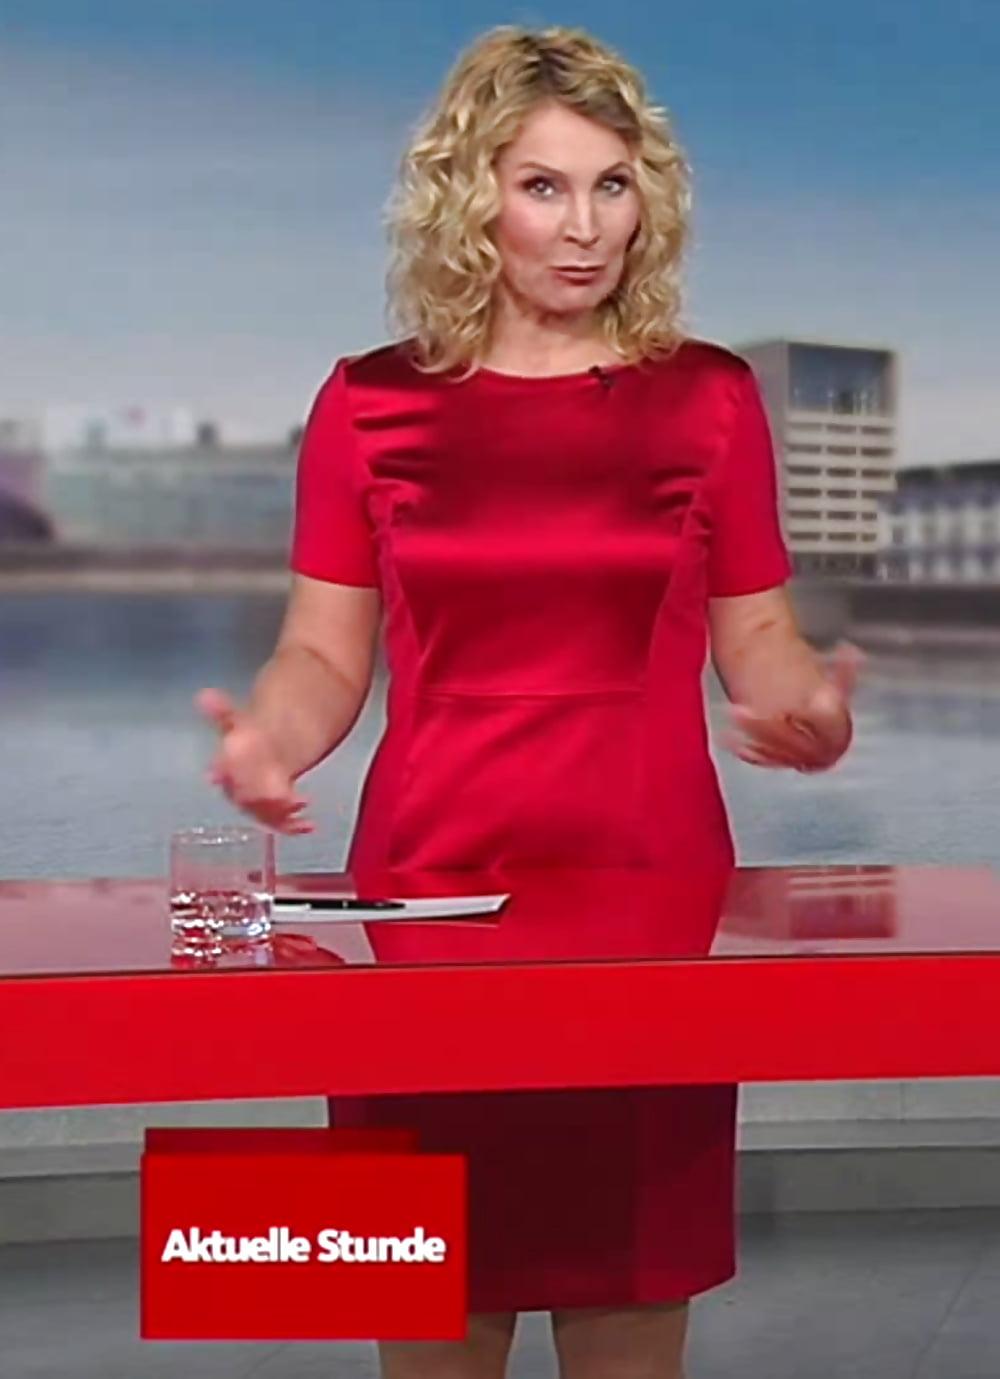 Susanne wil een pornofilmpje maken - 1 3